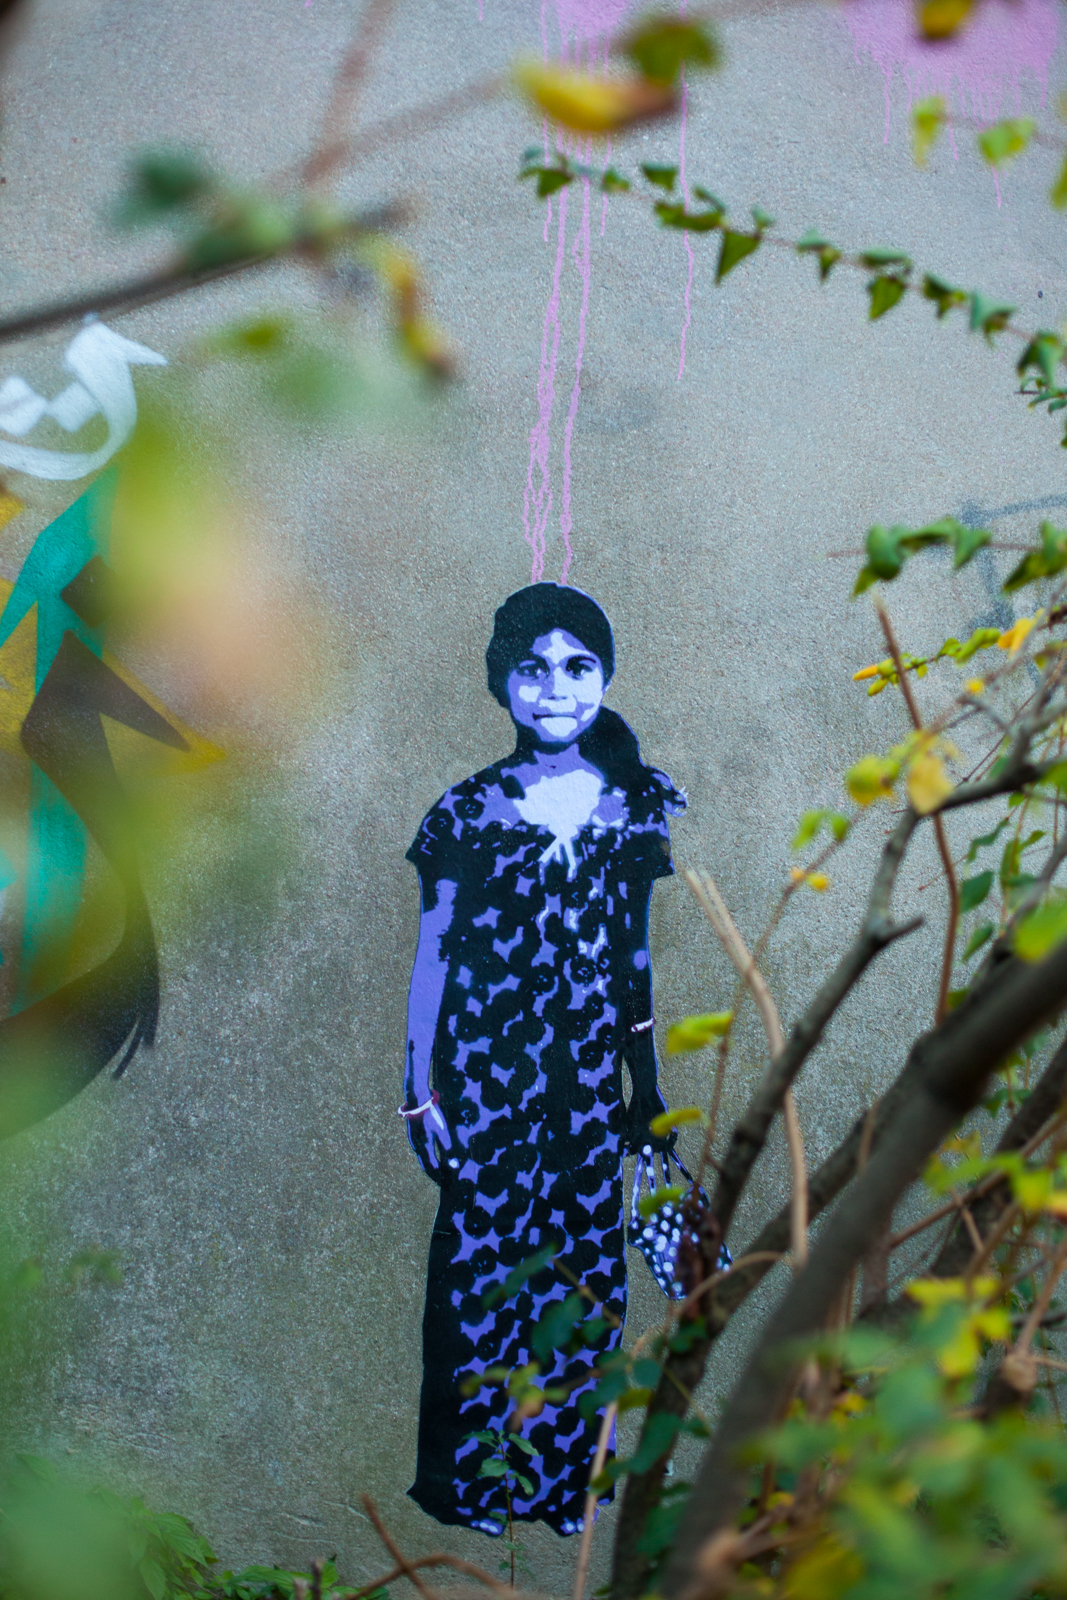 street art vitry-sur-seine, street art vitry, street art val-de-marne, street art banlieue paris, art urbain vitry, art urbain vitry-sur-seine, art urbain vitry, le guide du street art à paris, stéphanie lombard, afk